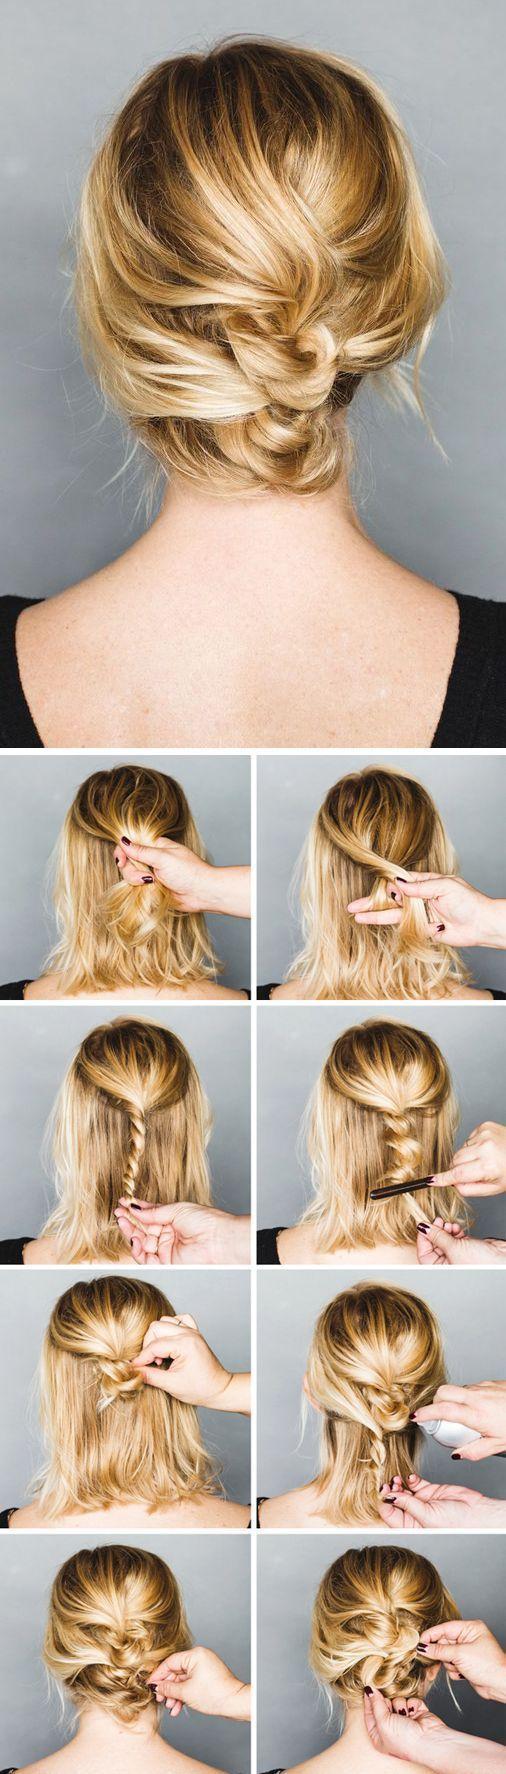 Stupendous 1000 Ideas About Short Hair Updo On Pinterest Hair Updo Short Hairstyles Gunalazisus